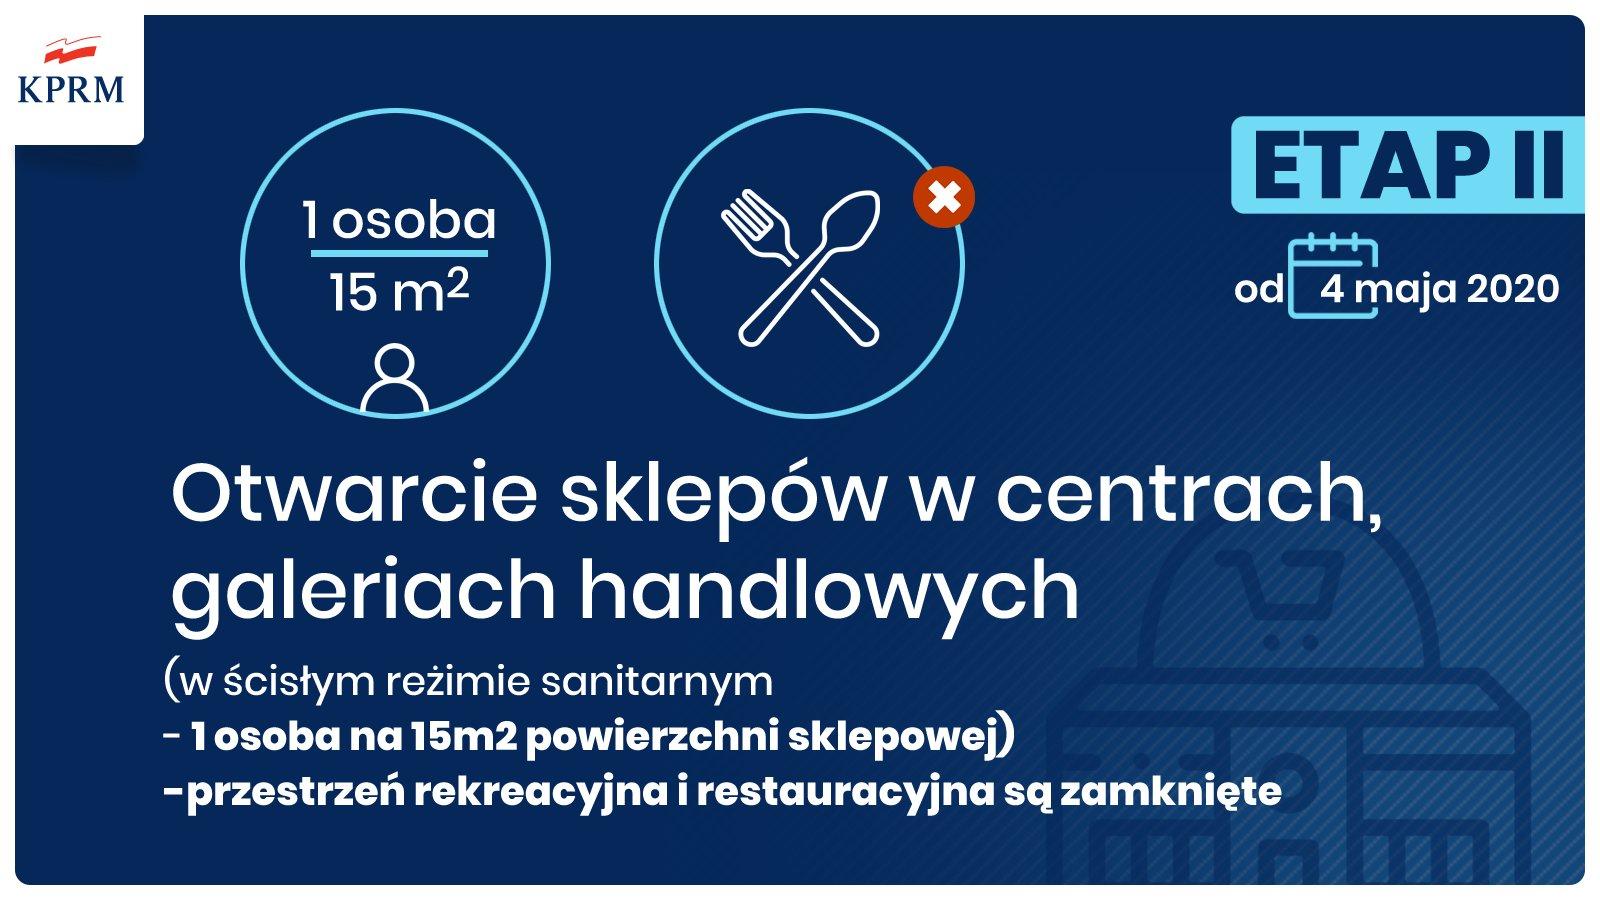 http://m.82-200.pl/2020/04/orig/etap03-5795.jpg